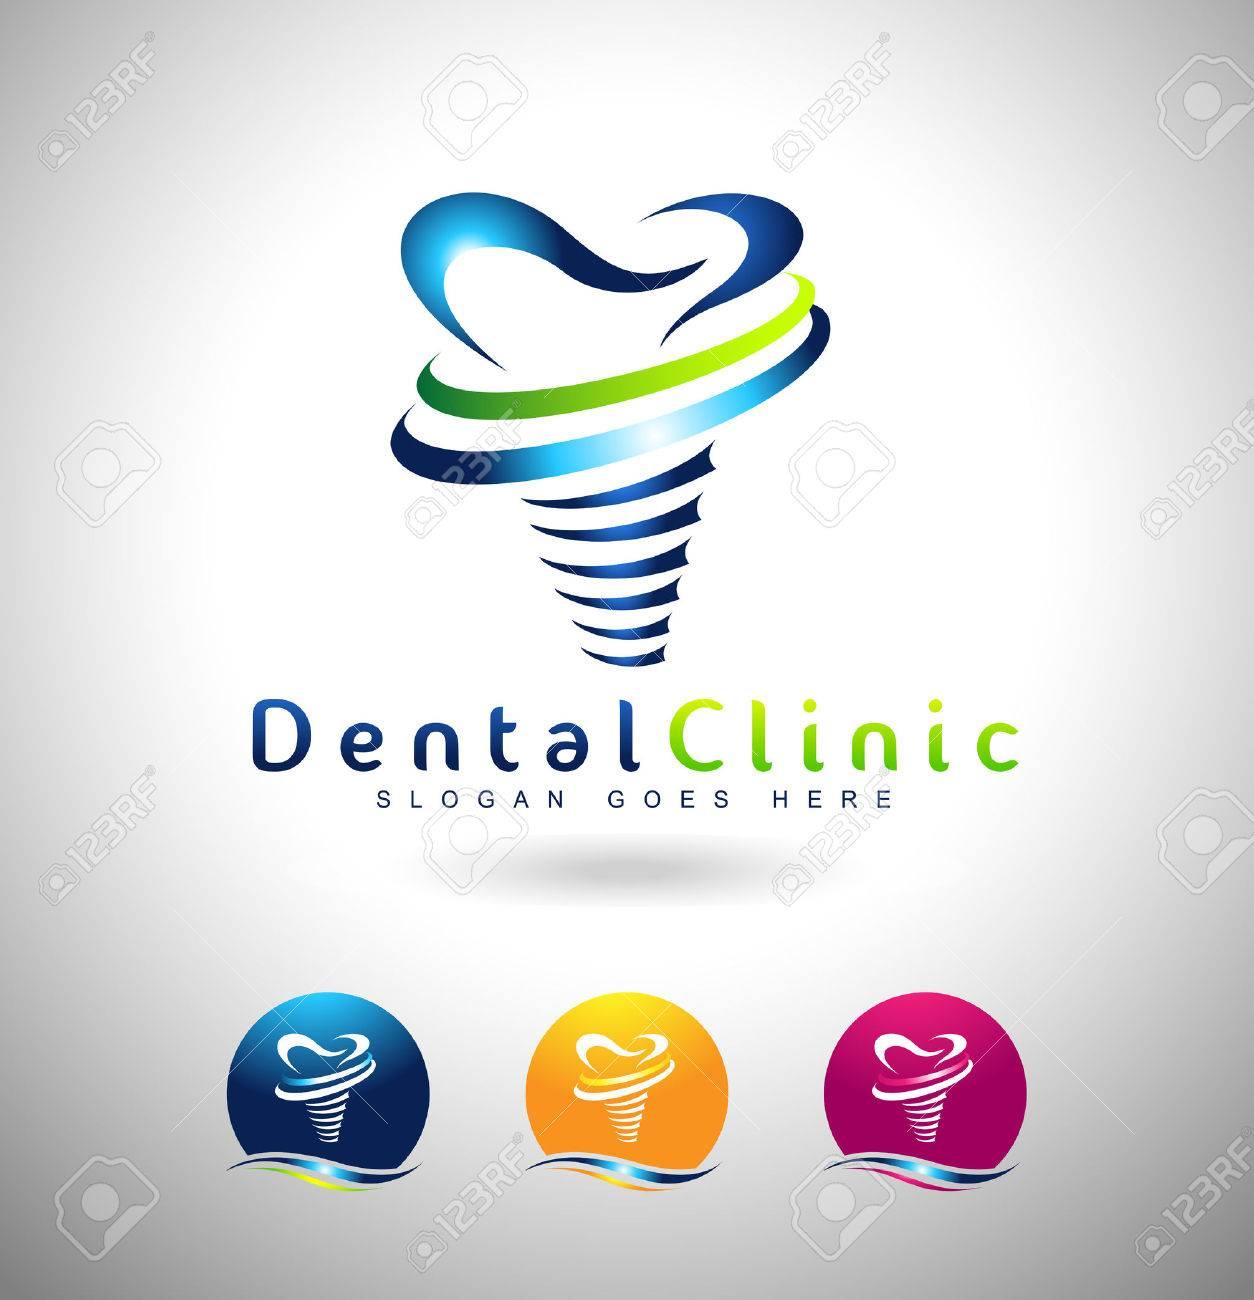 dental implant design dentist logo dental implants clinic creative